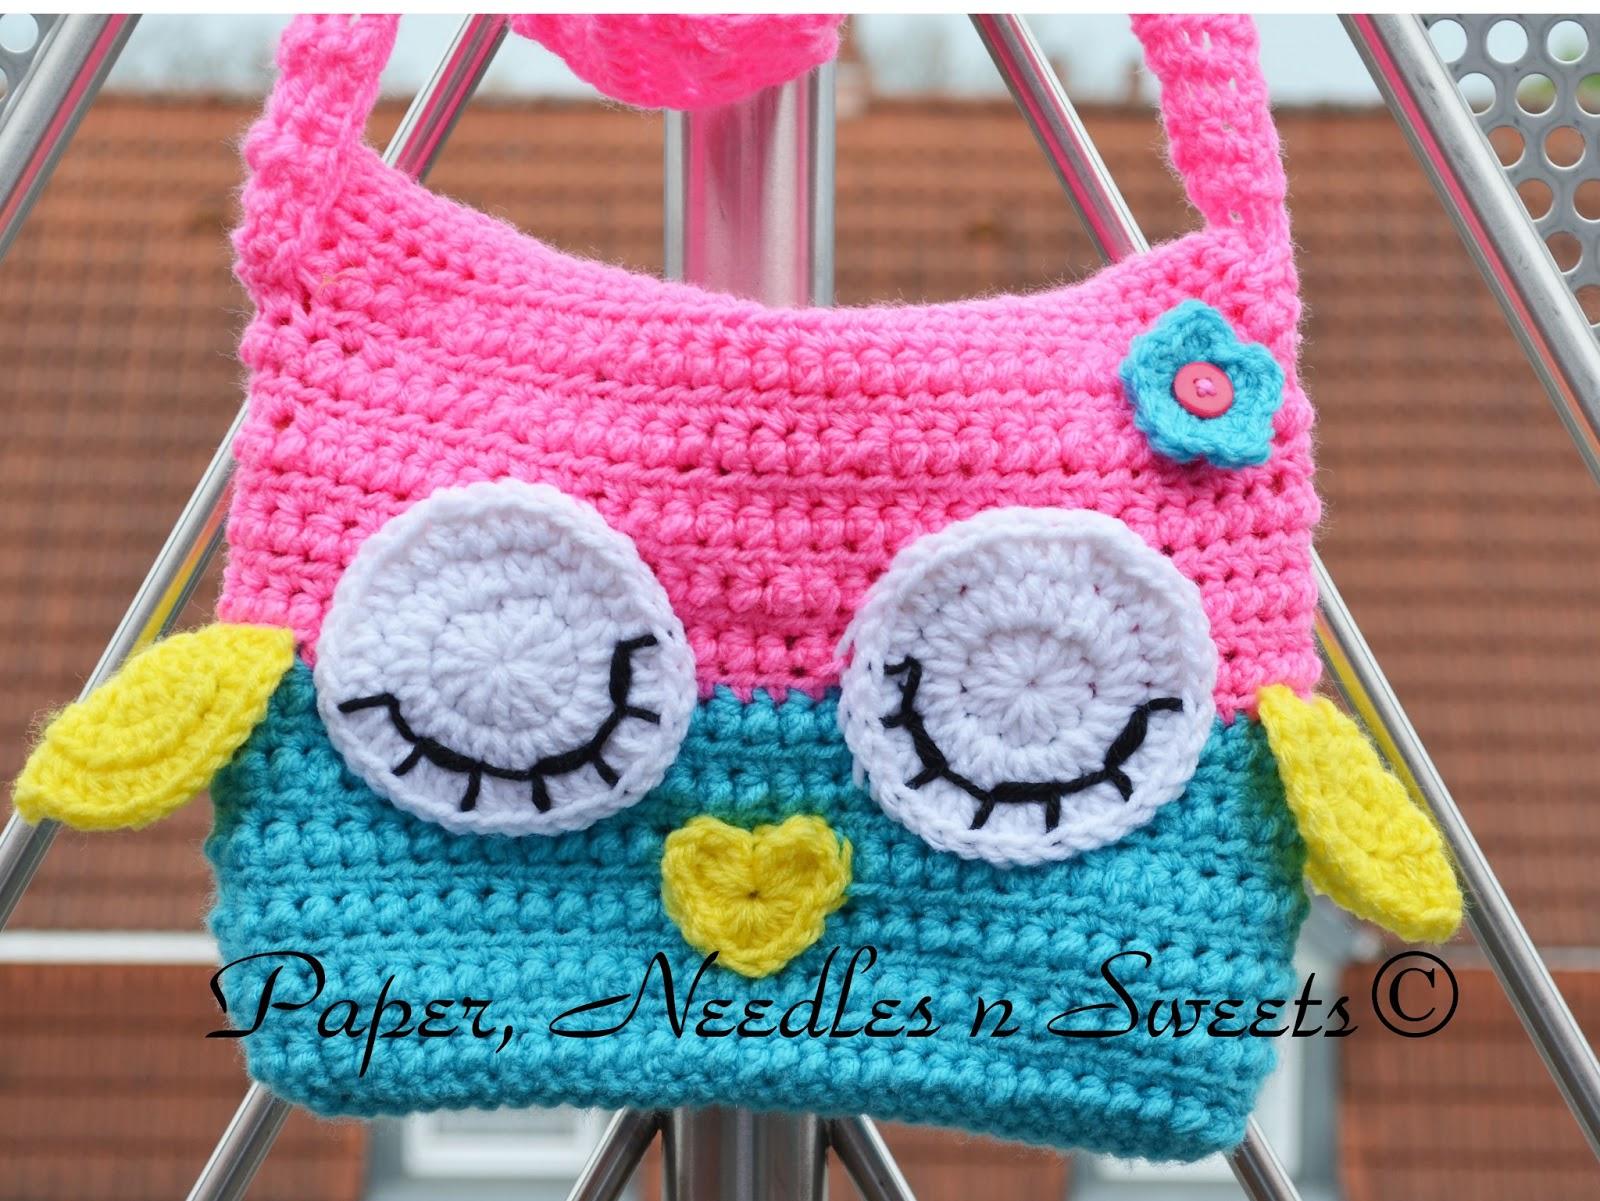 Free Crochet Patterns For Owl Purses : Paper, Needles n Sweets : Sleepy Owl Ipad Crochet Bag